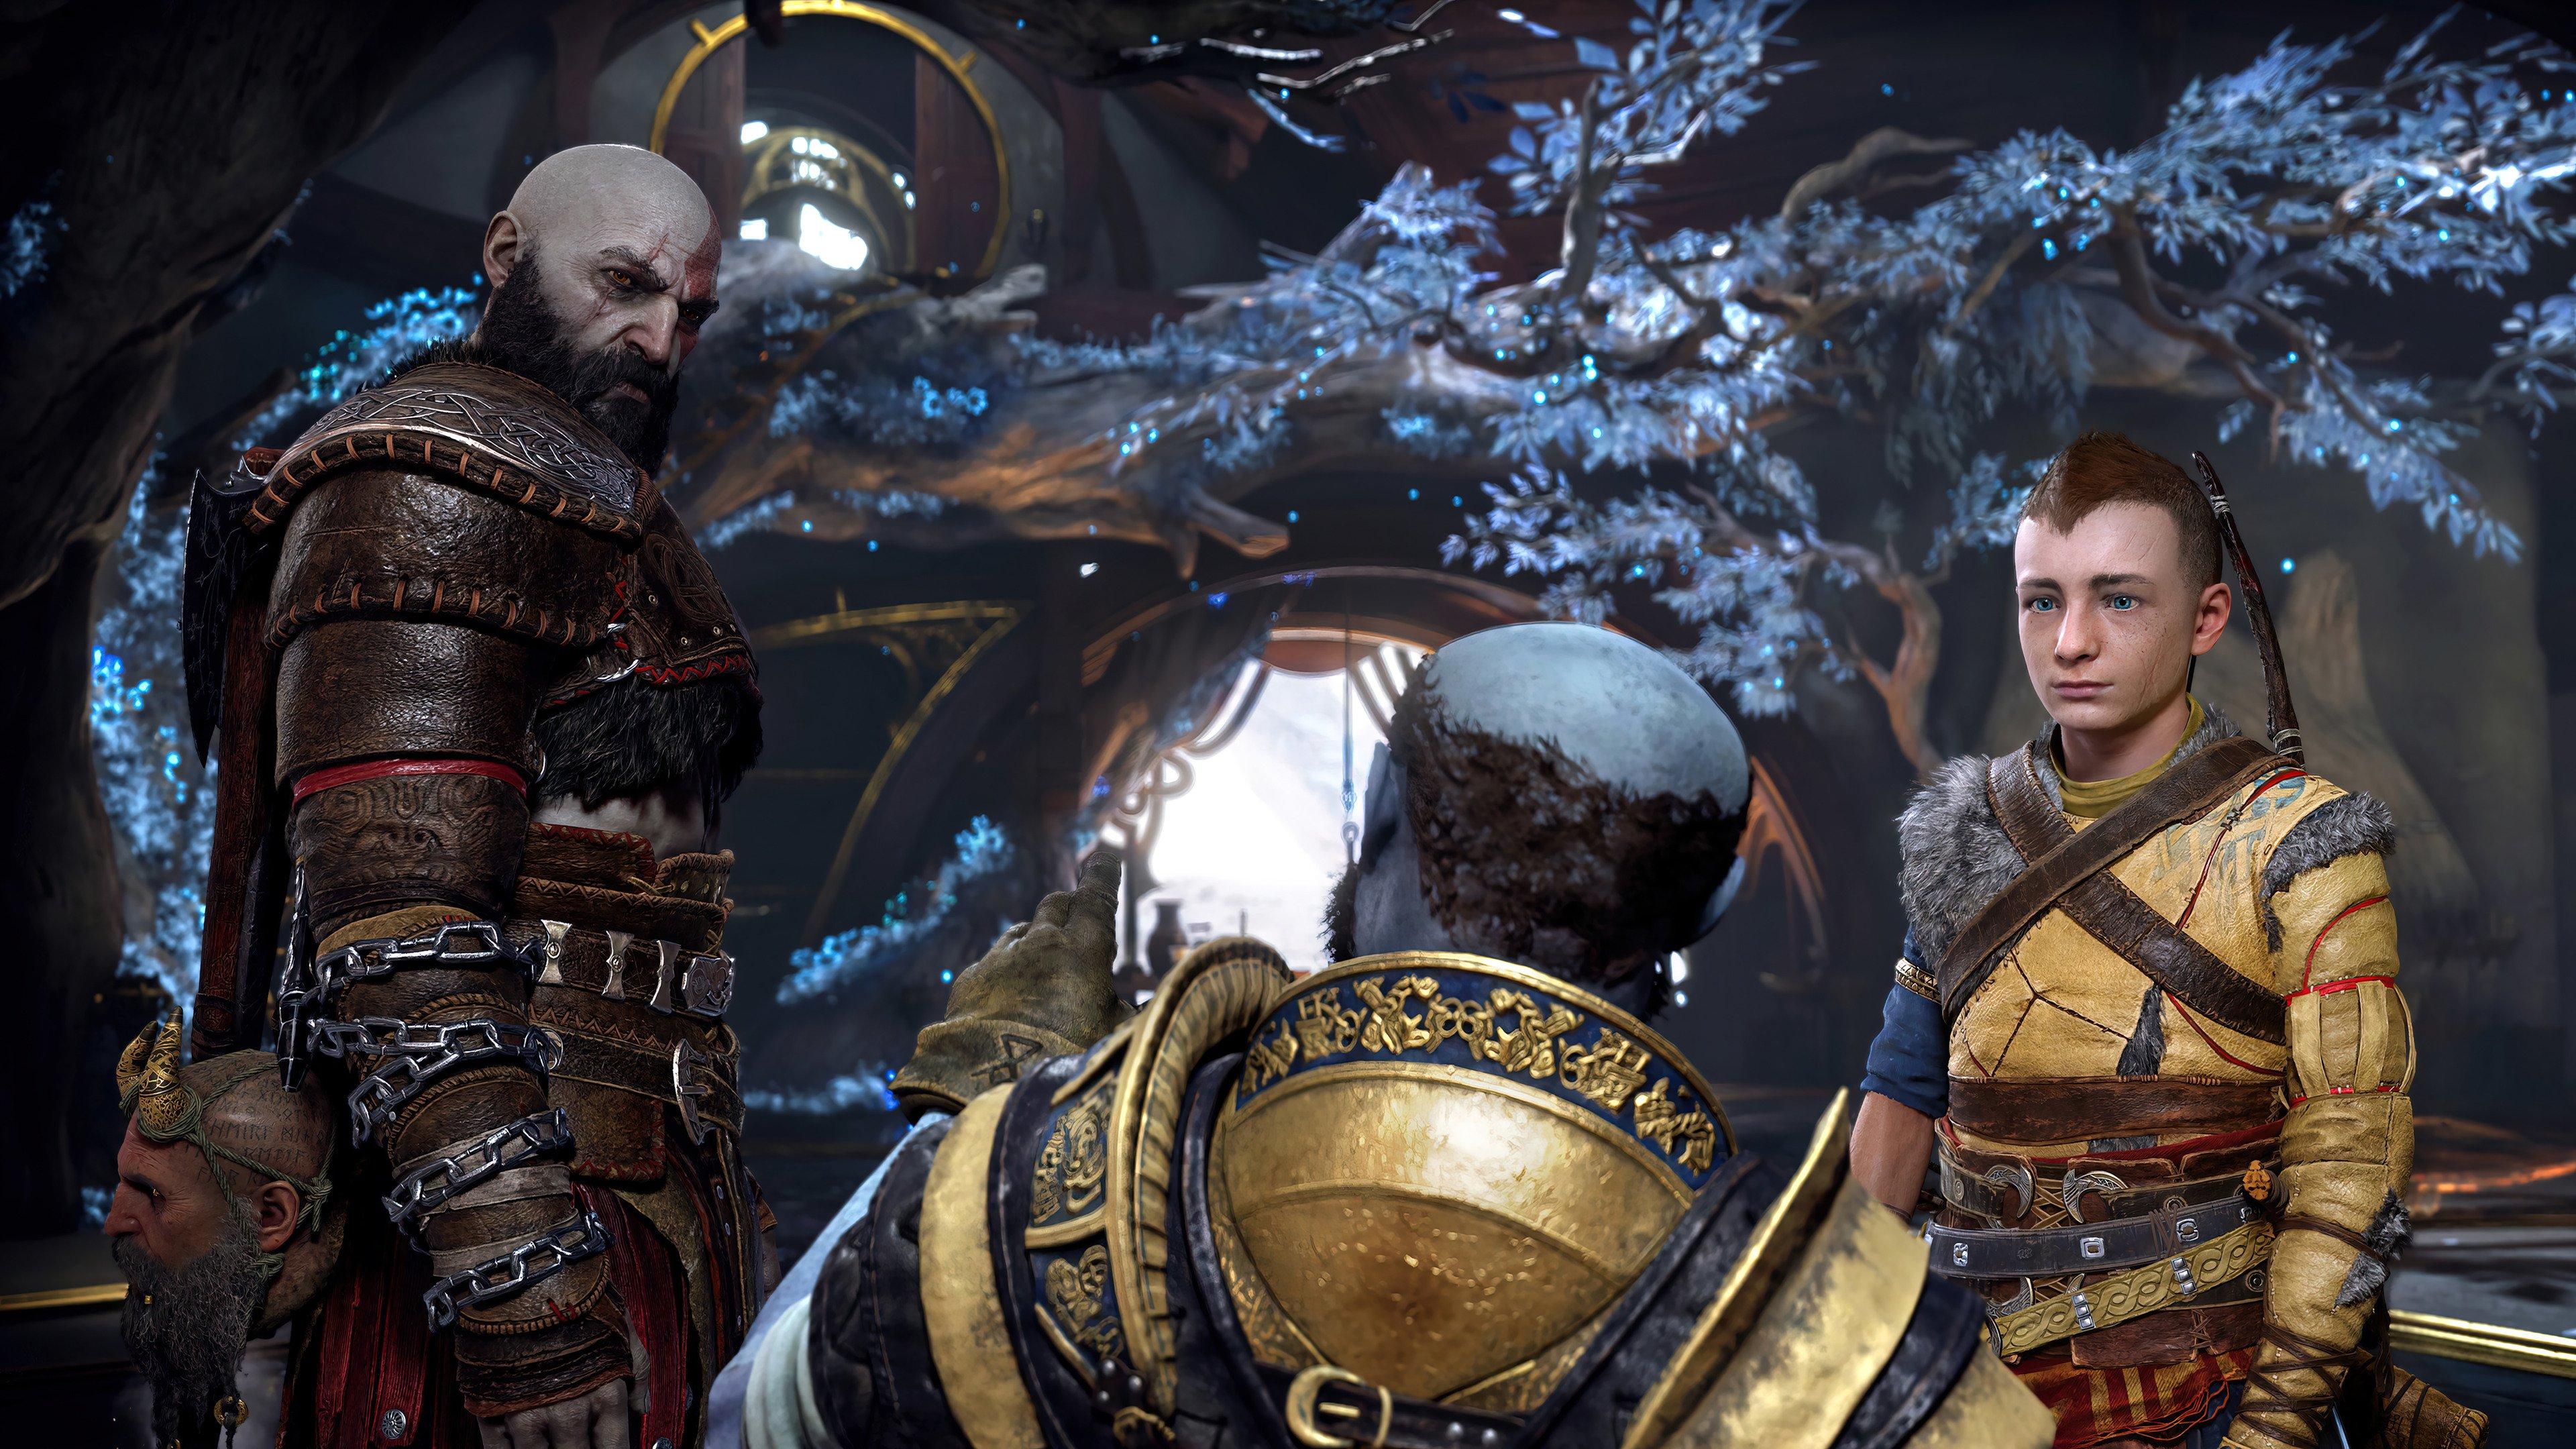 Fondos de pantalla Ragnarok Kratos y Atreus God of War